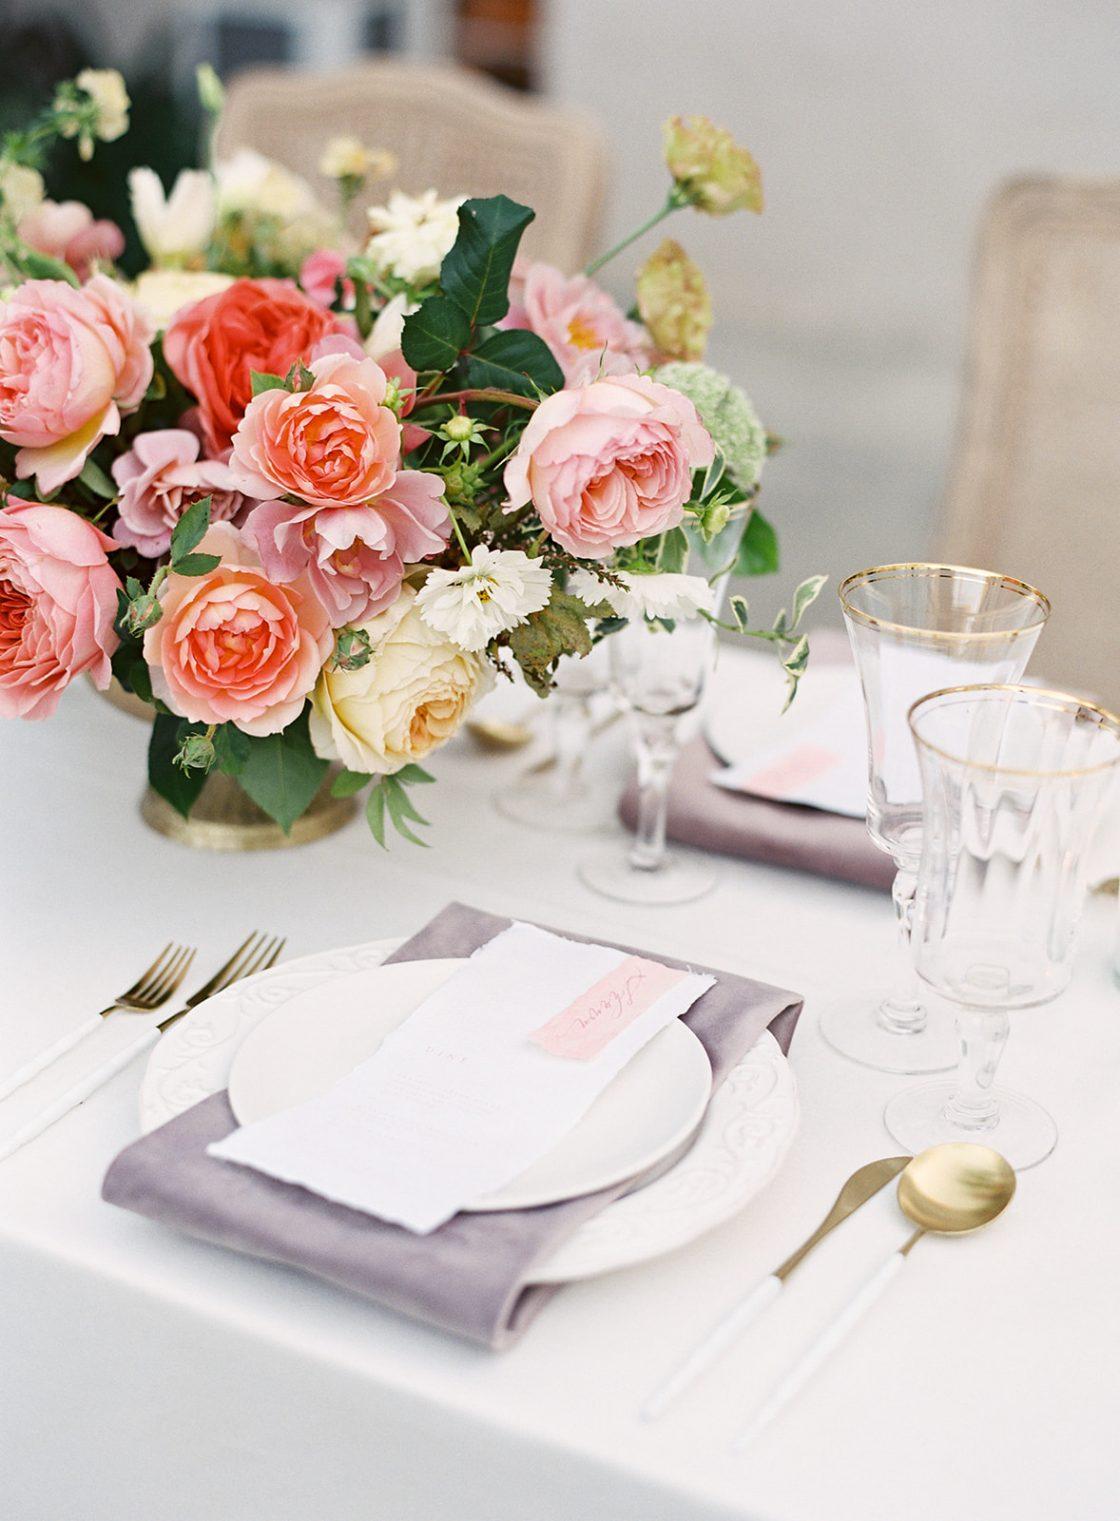 Modern Elegant Wedding Placesetting